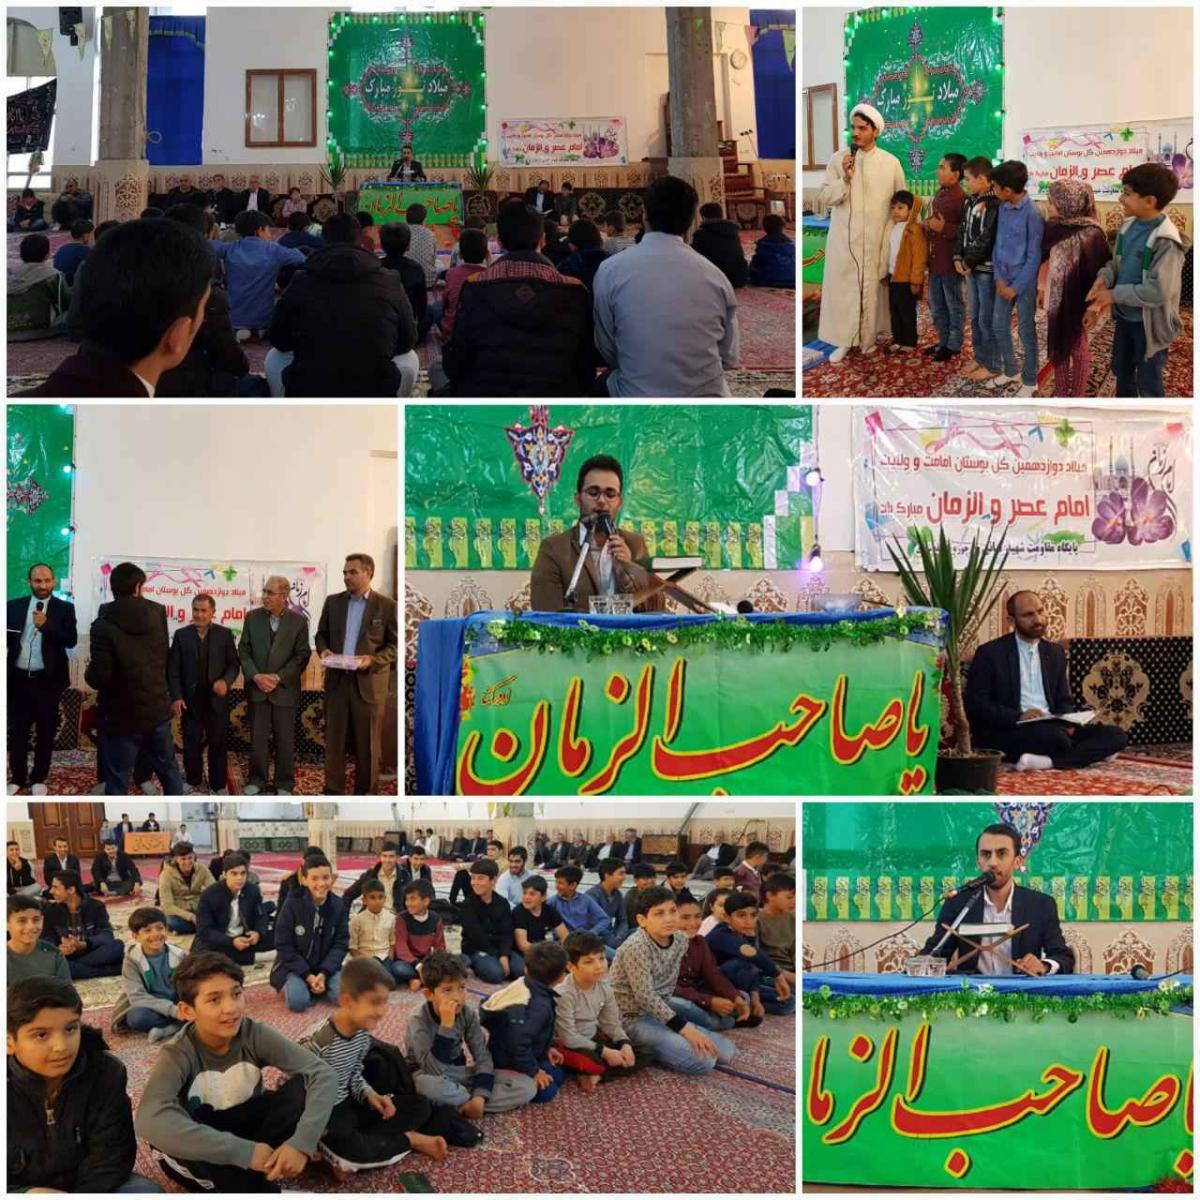 نیمه شعبان در مساجد علی بن ابیطالب و فاطمه الزهراء